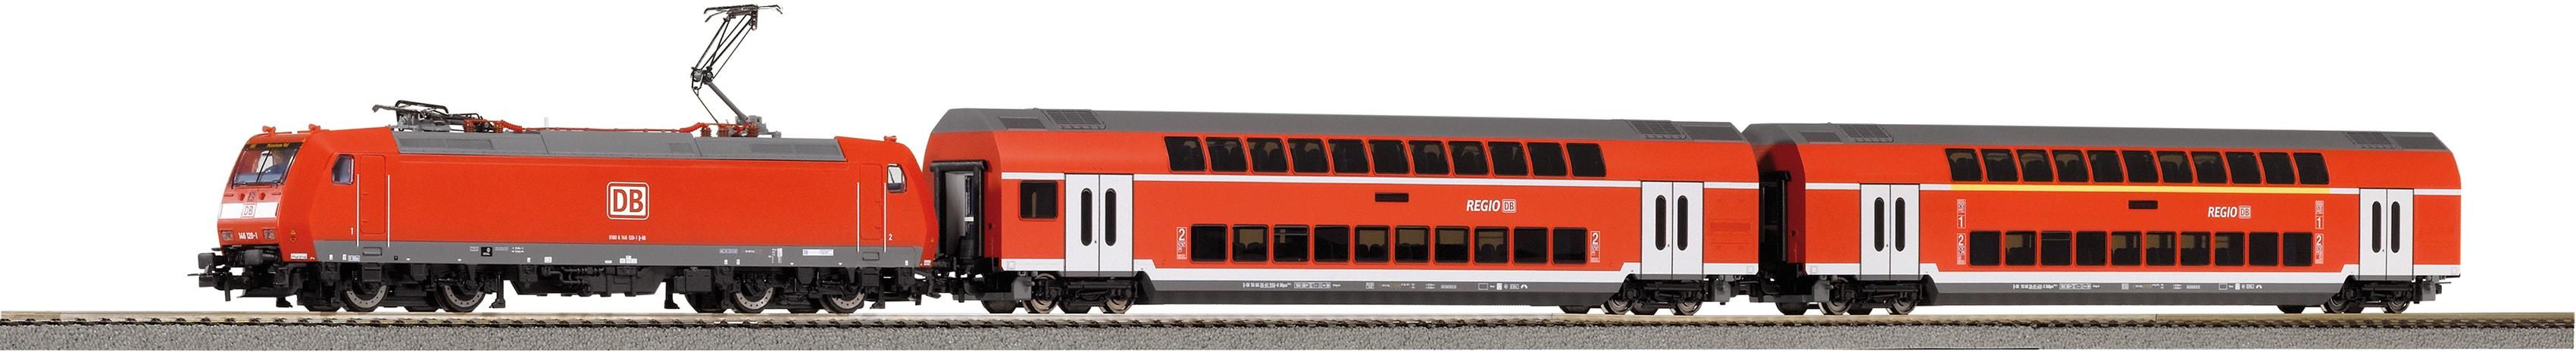 PIKO Modelleisenbahn-Set SmartControl light Doppelstockpersonenzug DB, (59023) rot Kinder Modelleisenbahn-Sets Modelleisenbahnen Autos, Eisenbahn Modellbau